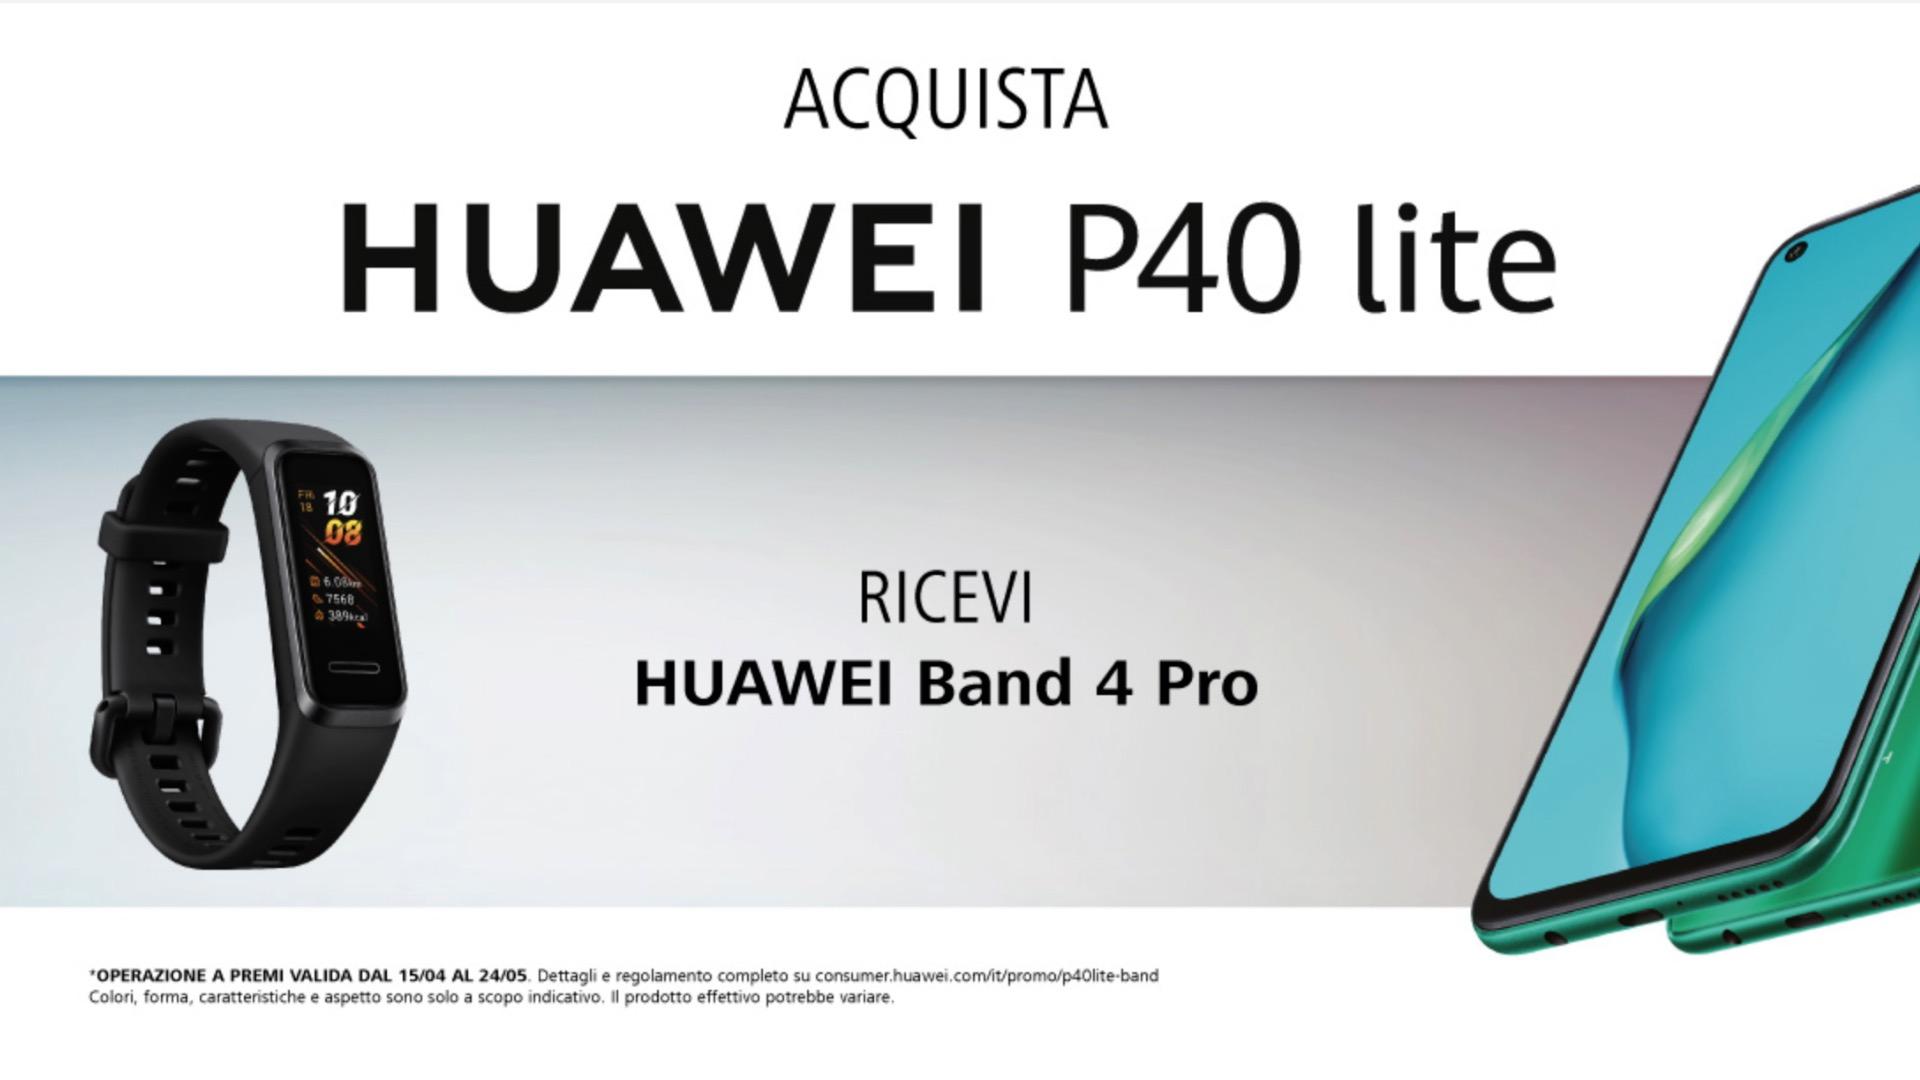 Huawei P40 Lite: migliori cover pellicole ed accessori - GizChina.it